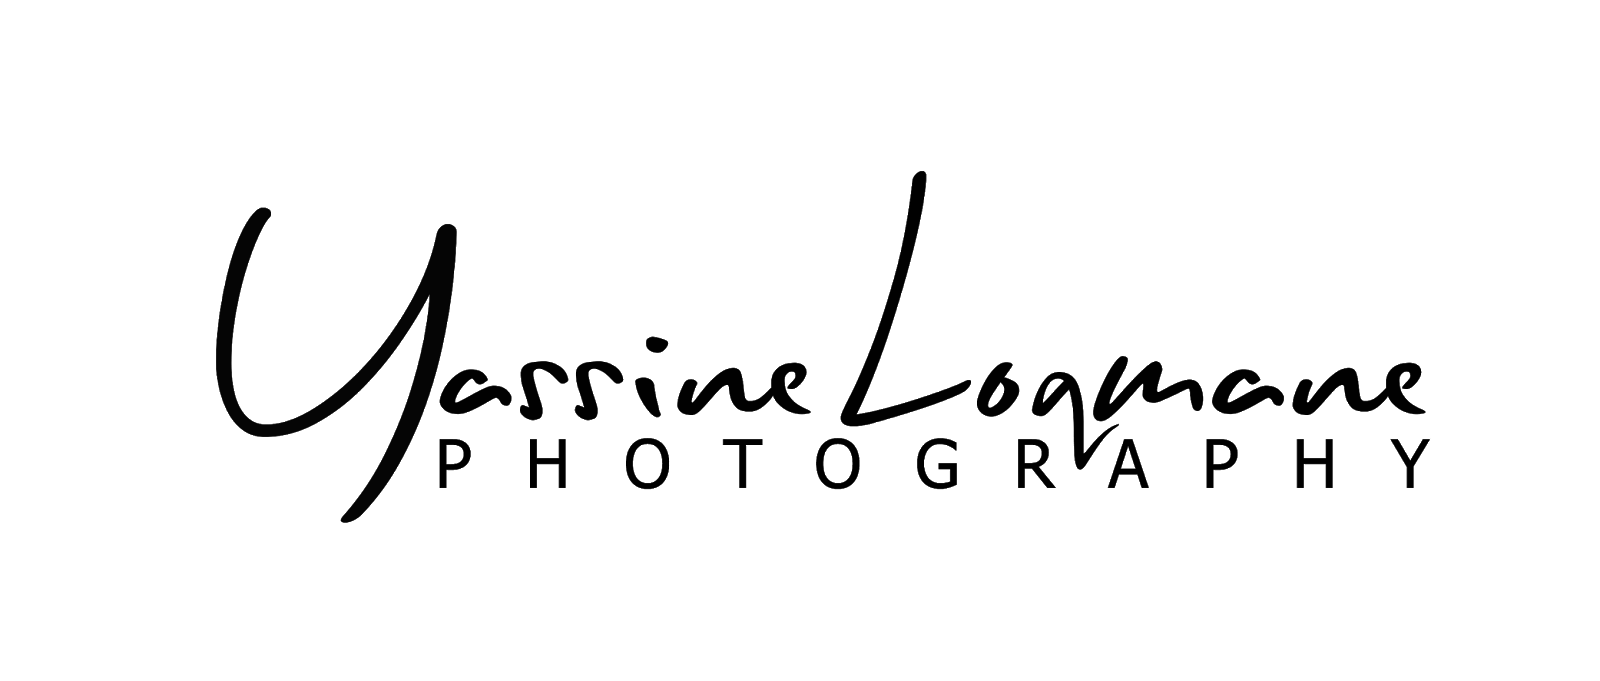 AQUA ORANGE FREE MOBILE LIGHTROOM PRESETS - Yassine Loqmane